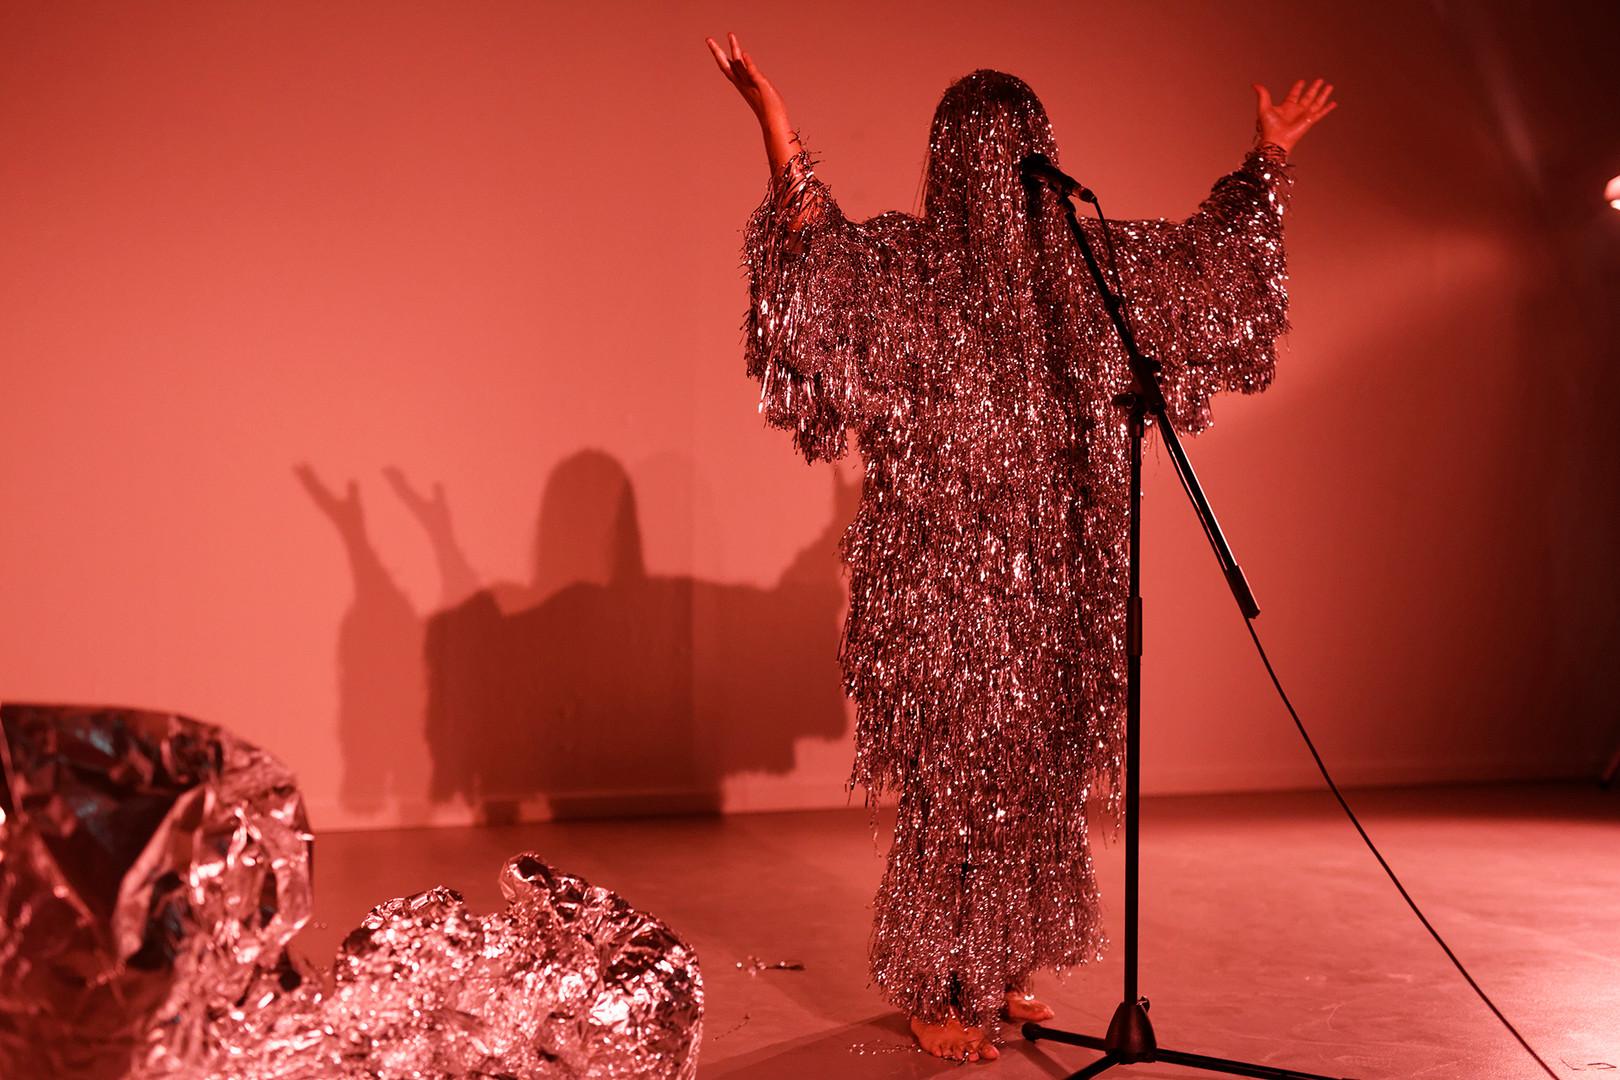 SINGLE, Fernanda Branco Polse, photo by Thomas Lenden